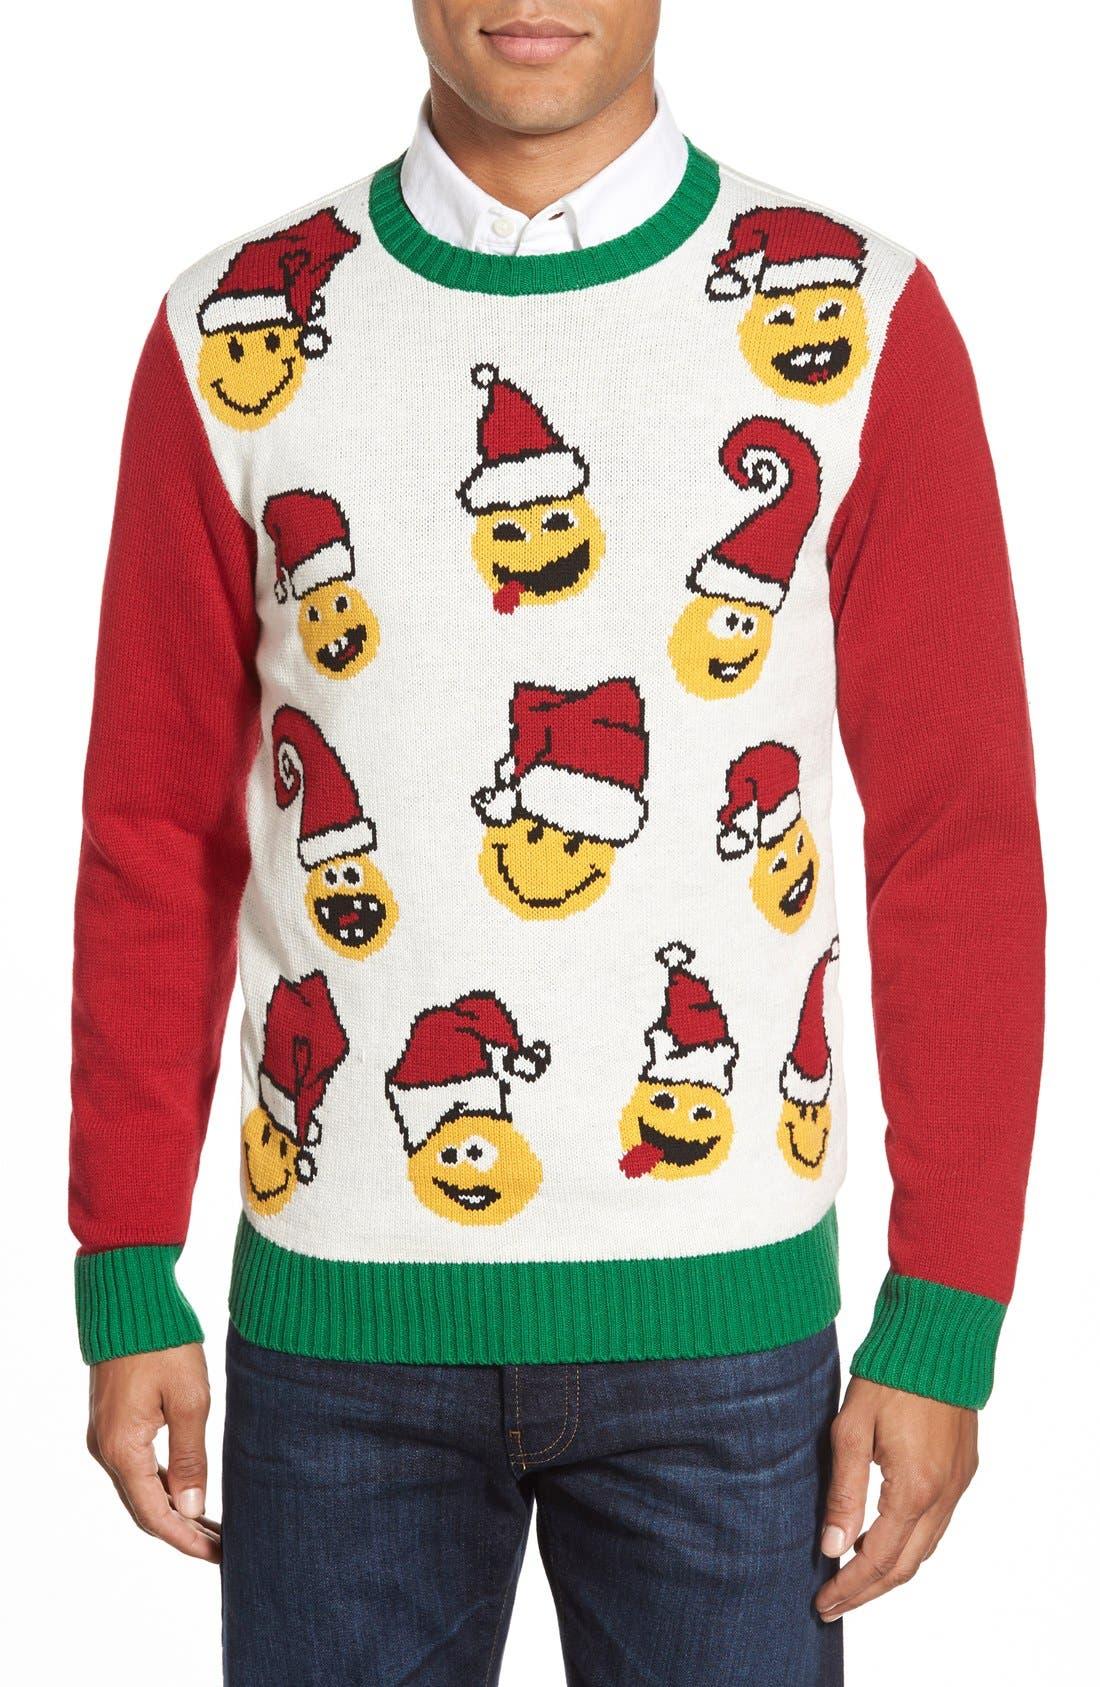 'Emoji Faces' Holiday Crewneck Sweater,                         Main,                         color,